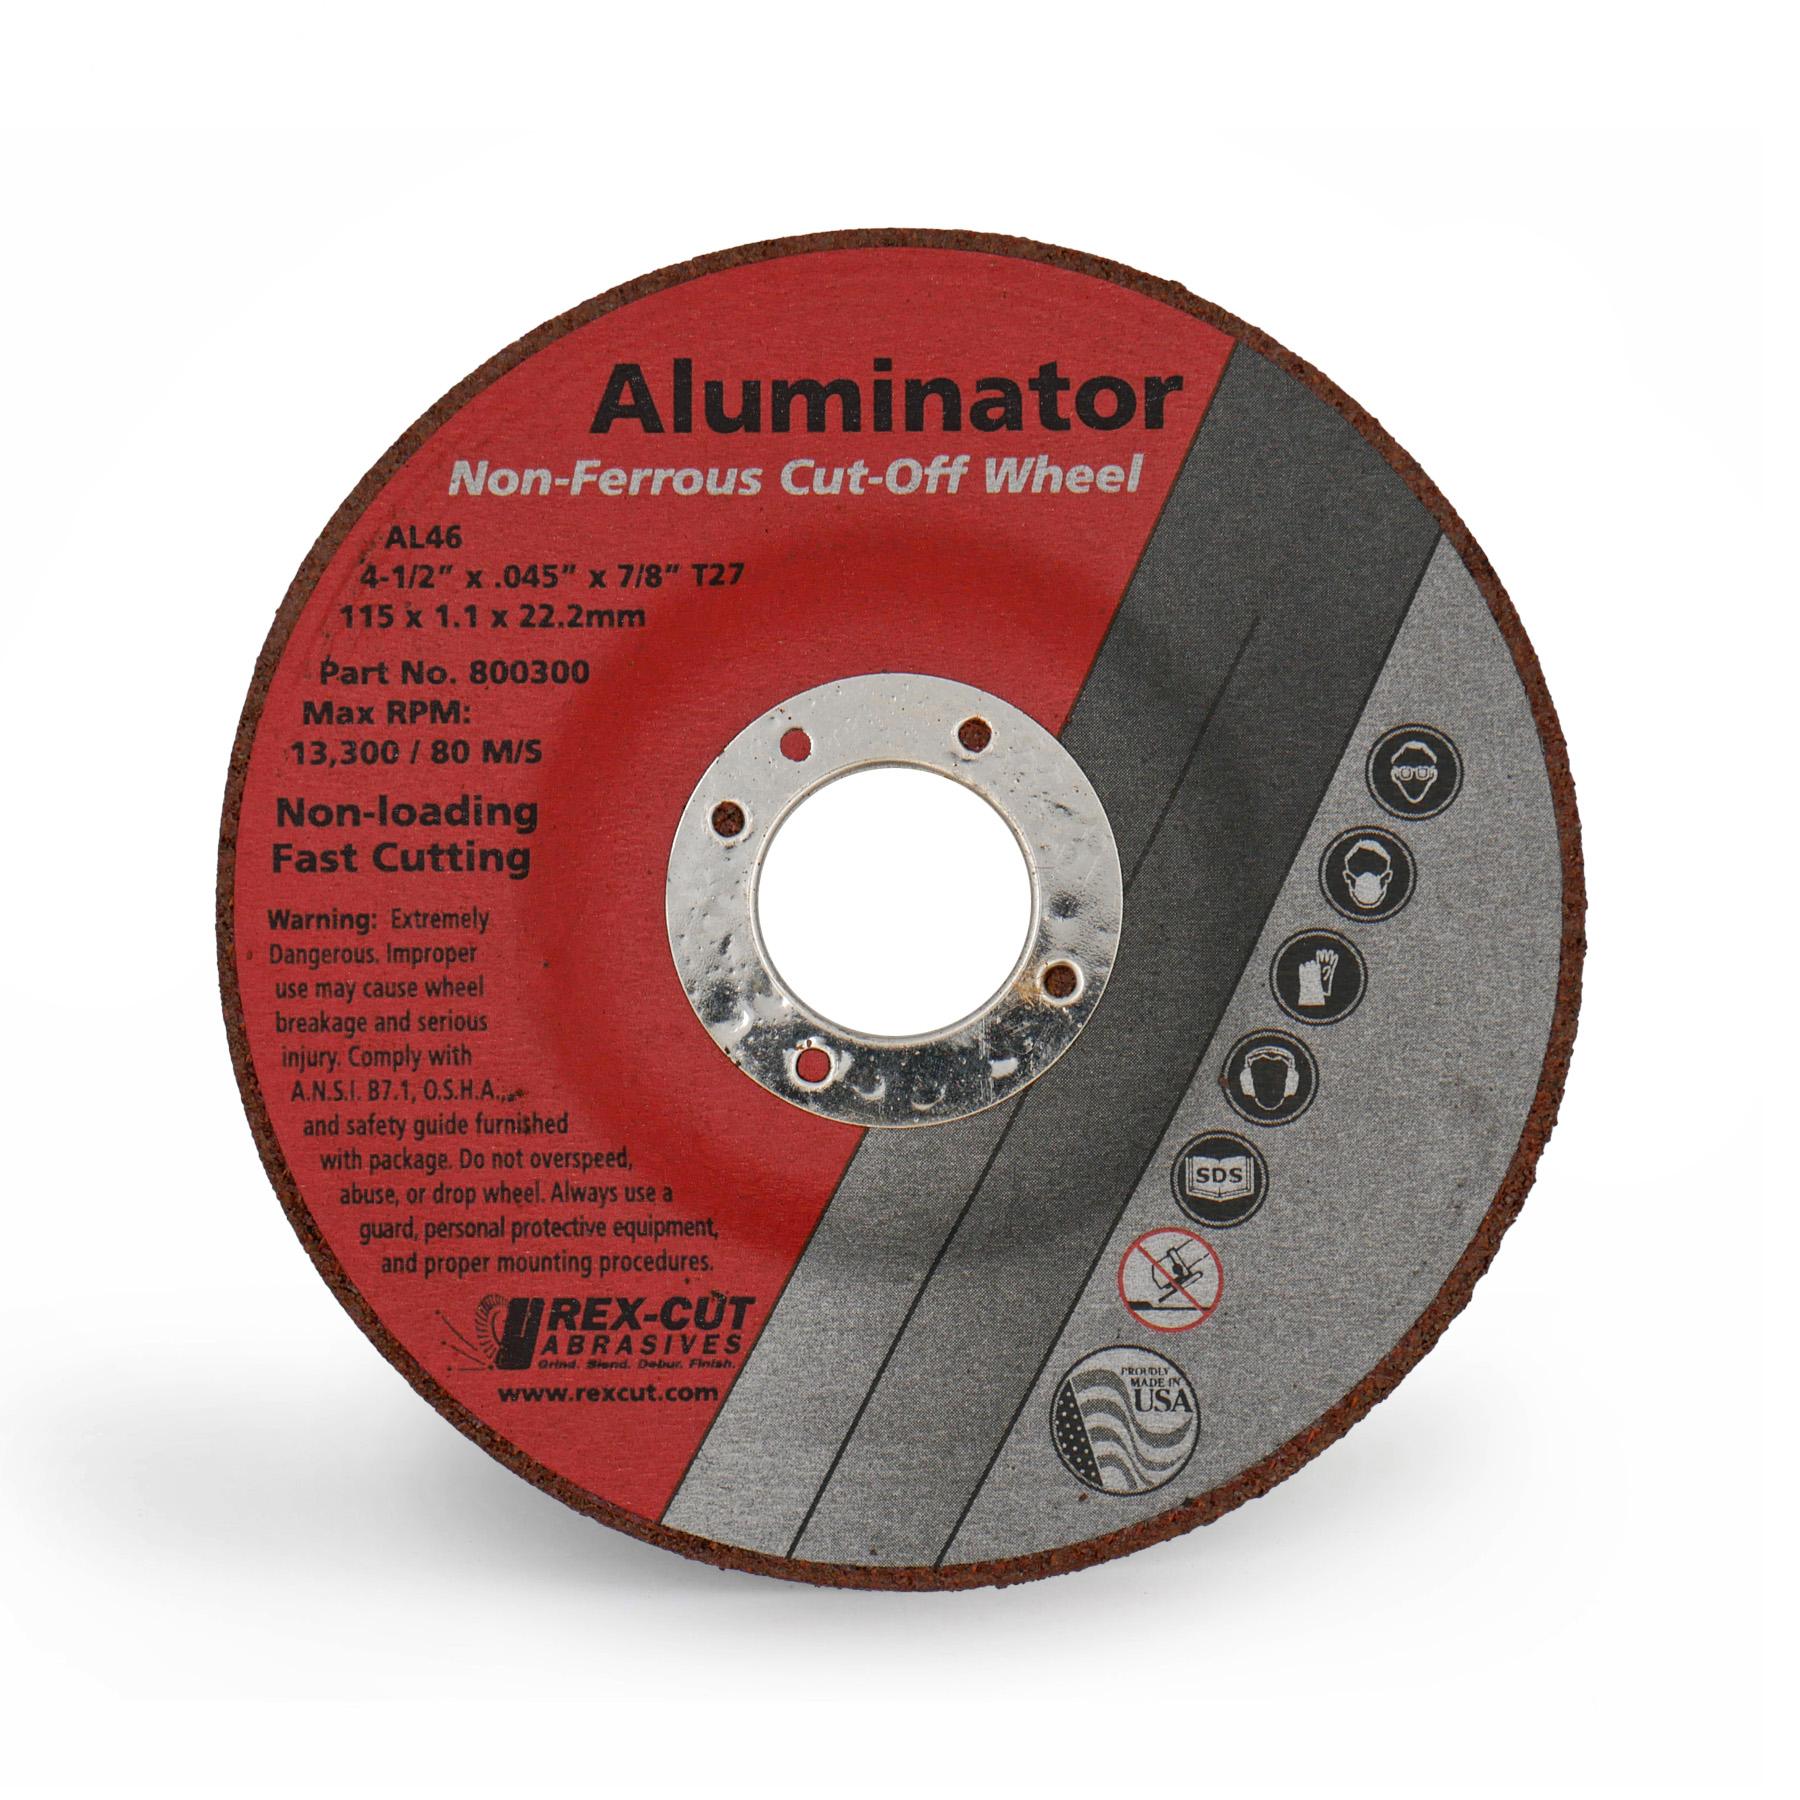 Aluminator Cut-Off Wheel